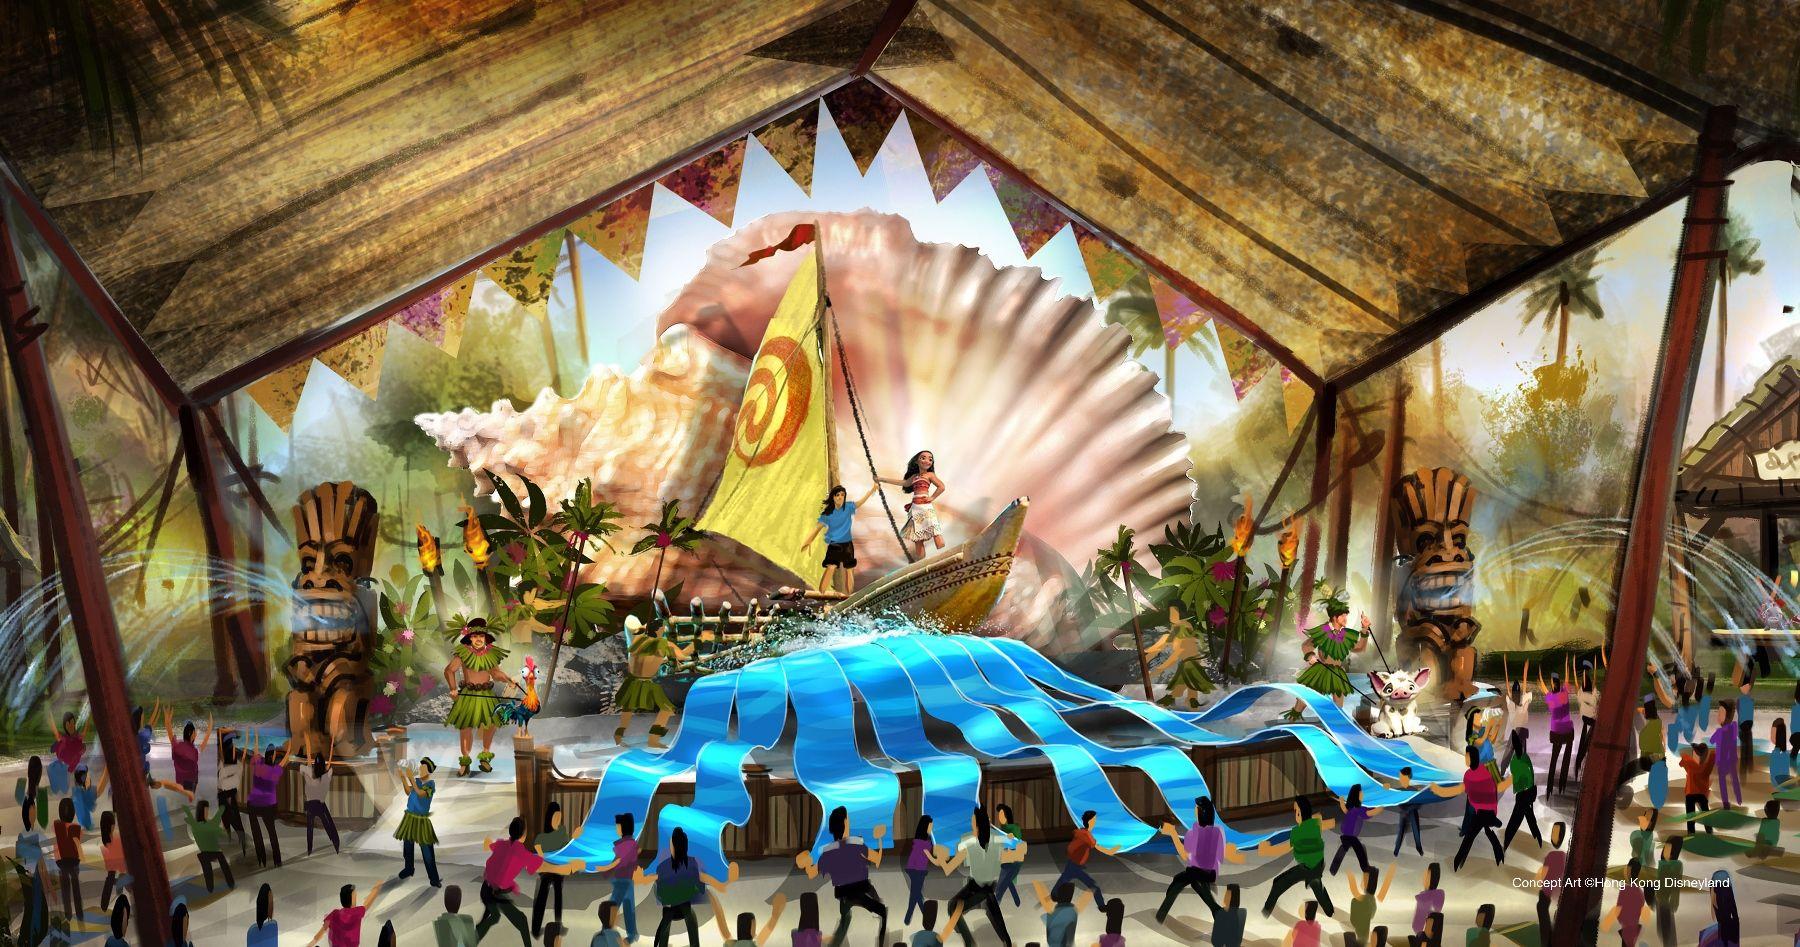 Hong Kong Disneyland Adventureland Show Place